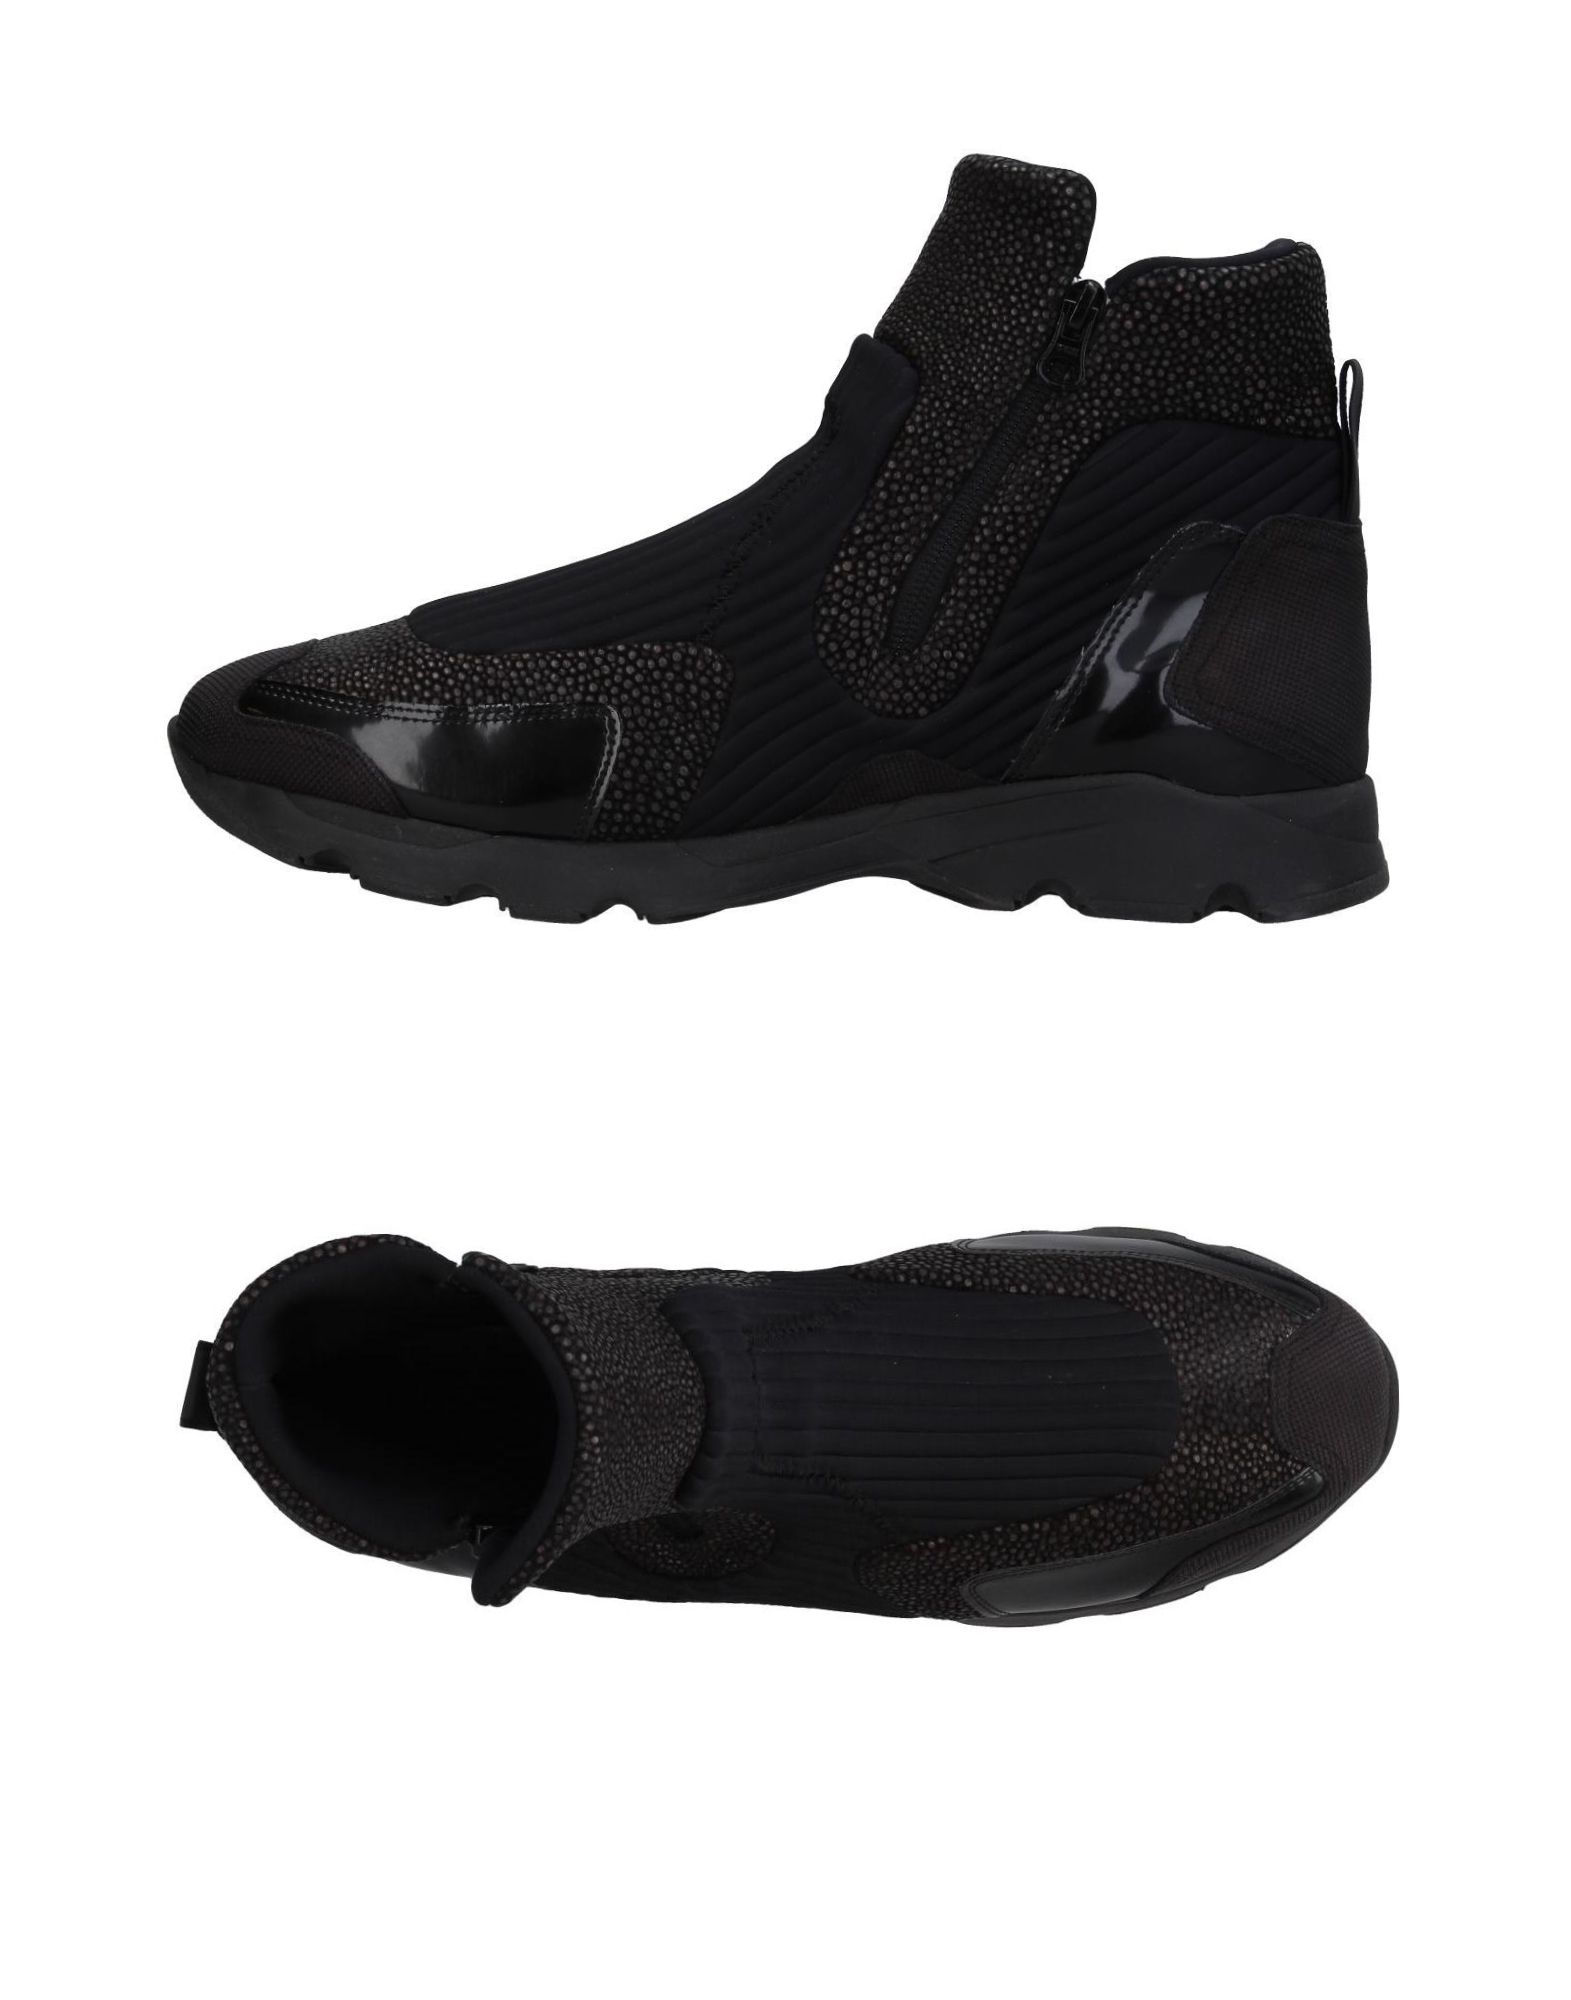 Mm6 Mm6 Mm6 Maison Margiela Sneakers Herren  11401485VX 2aea3e